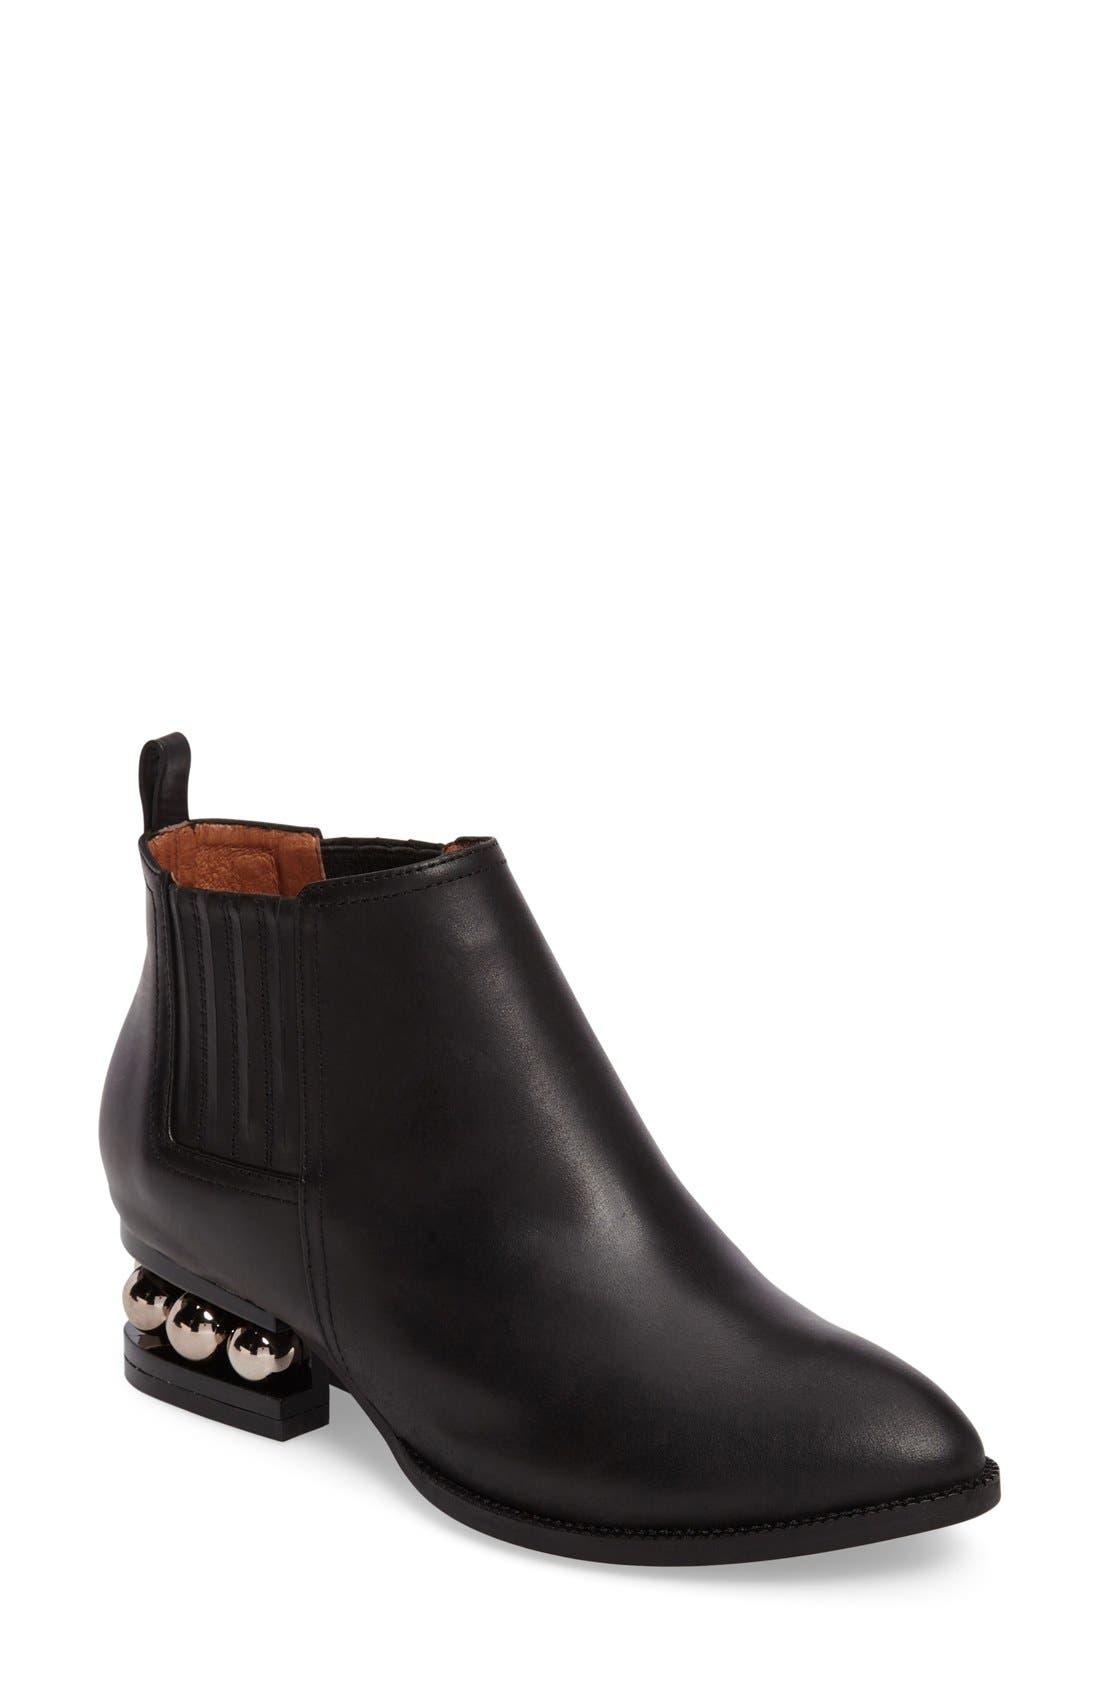 Metcalf Almond Toe Bootie,                         Main,                         color, Black Matte